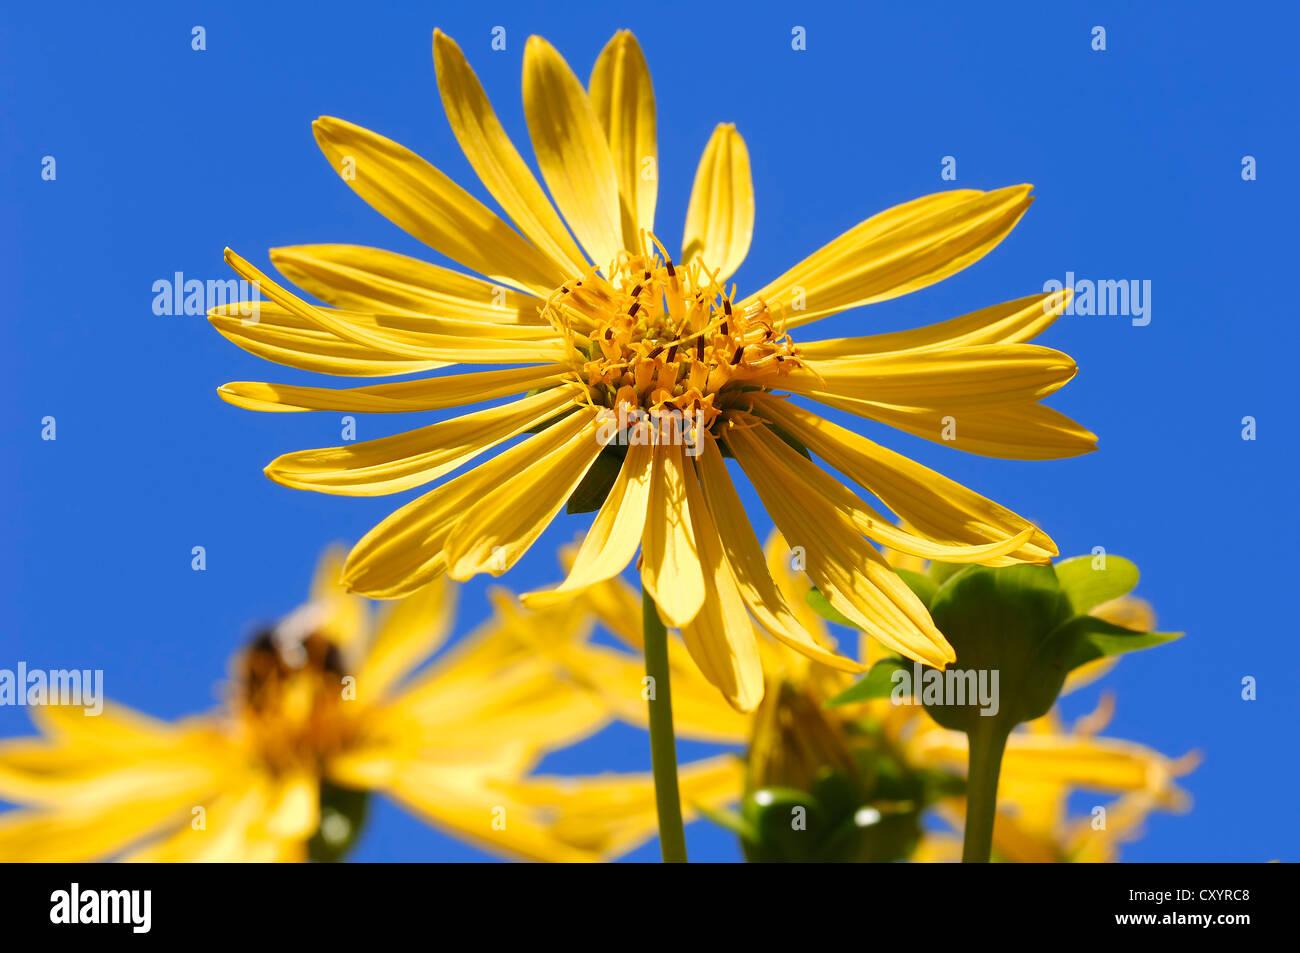 Jerusalem Artichoke, sunroot, sunchoke, earth apple or topinambour (Helianthus tuberosus), flower, occurrence in - Stock Image